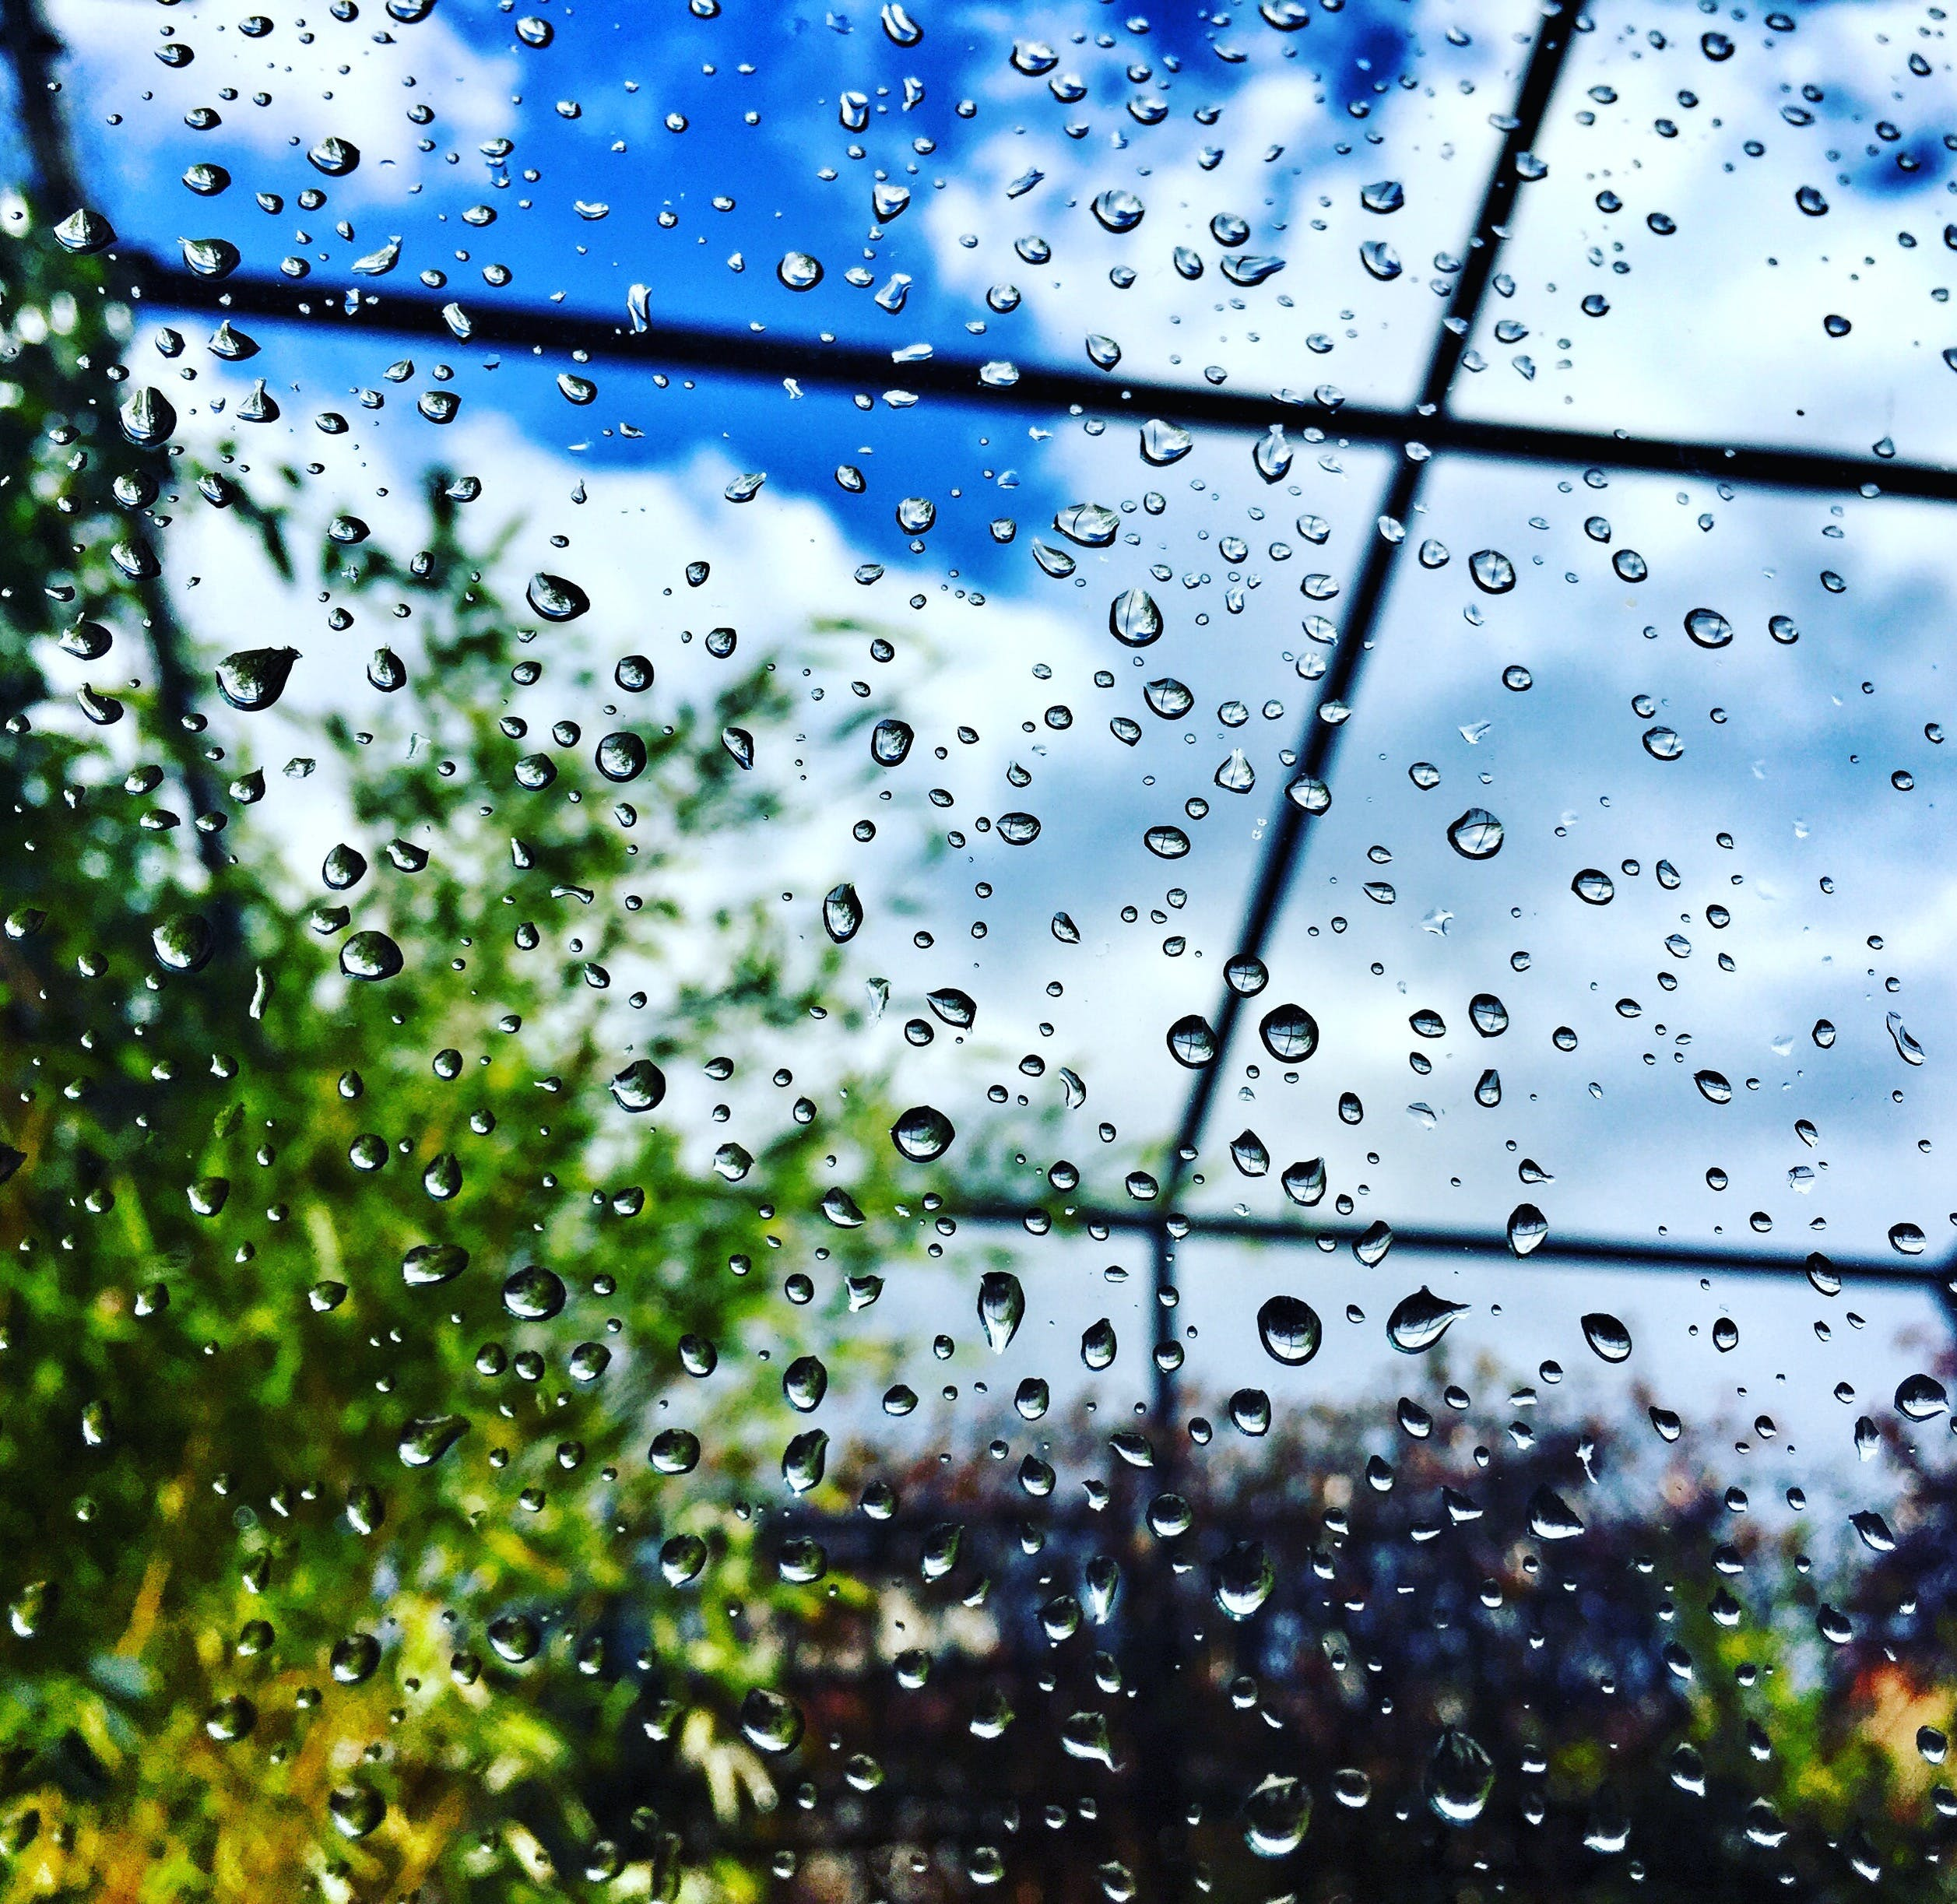 Water Dew Drop on Glass